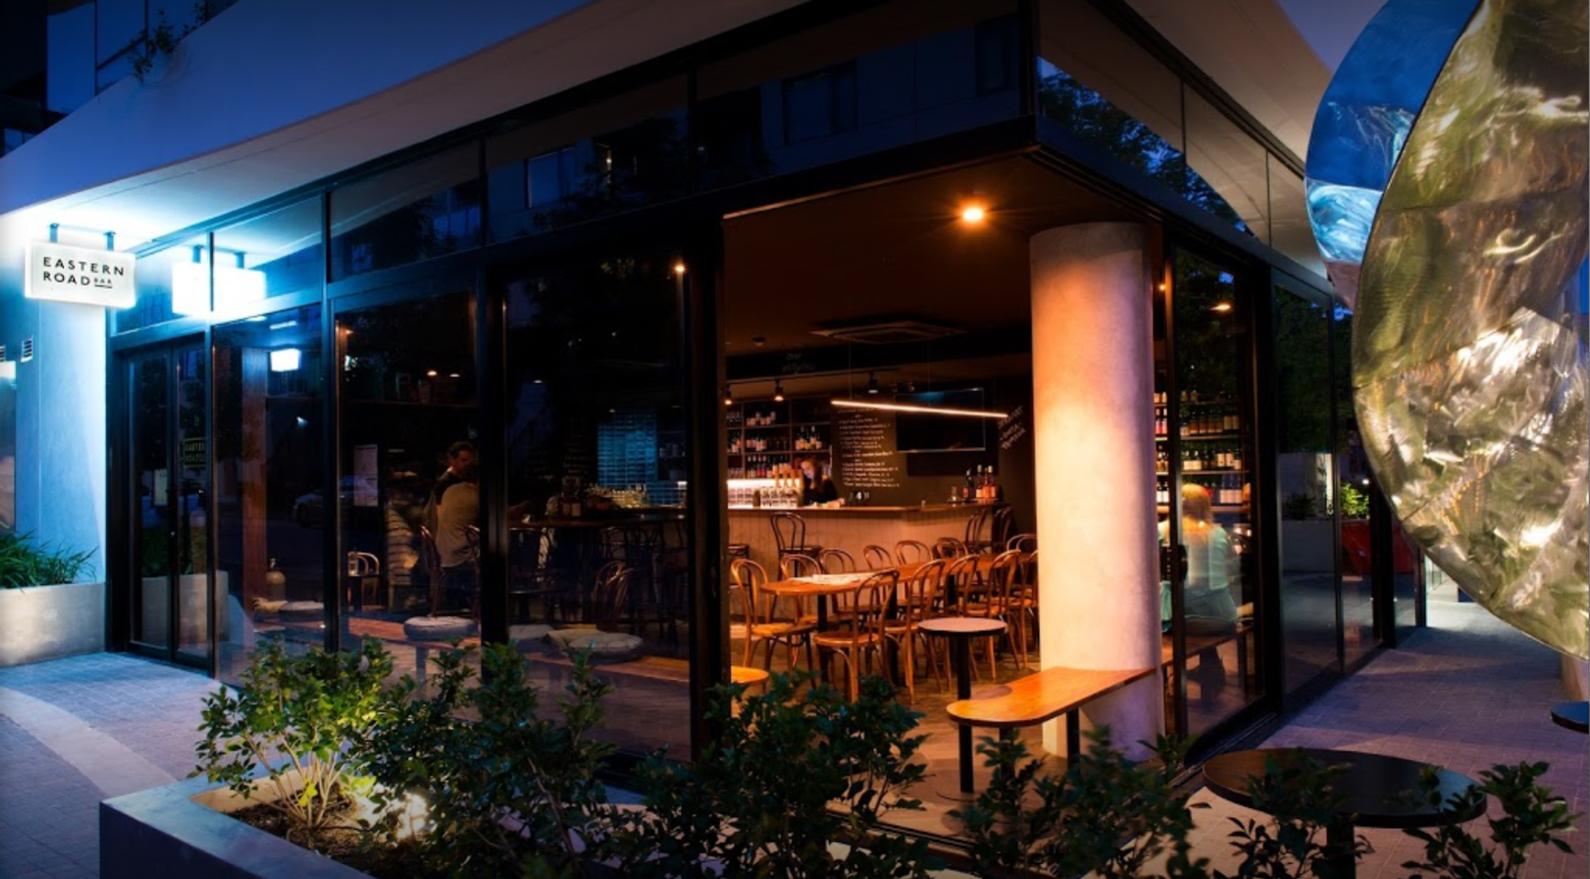 Studio-Mimi-Moon-Eastern-Road-Bar-South-Melbourne-2